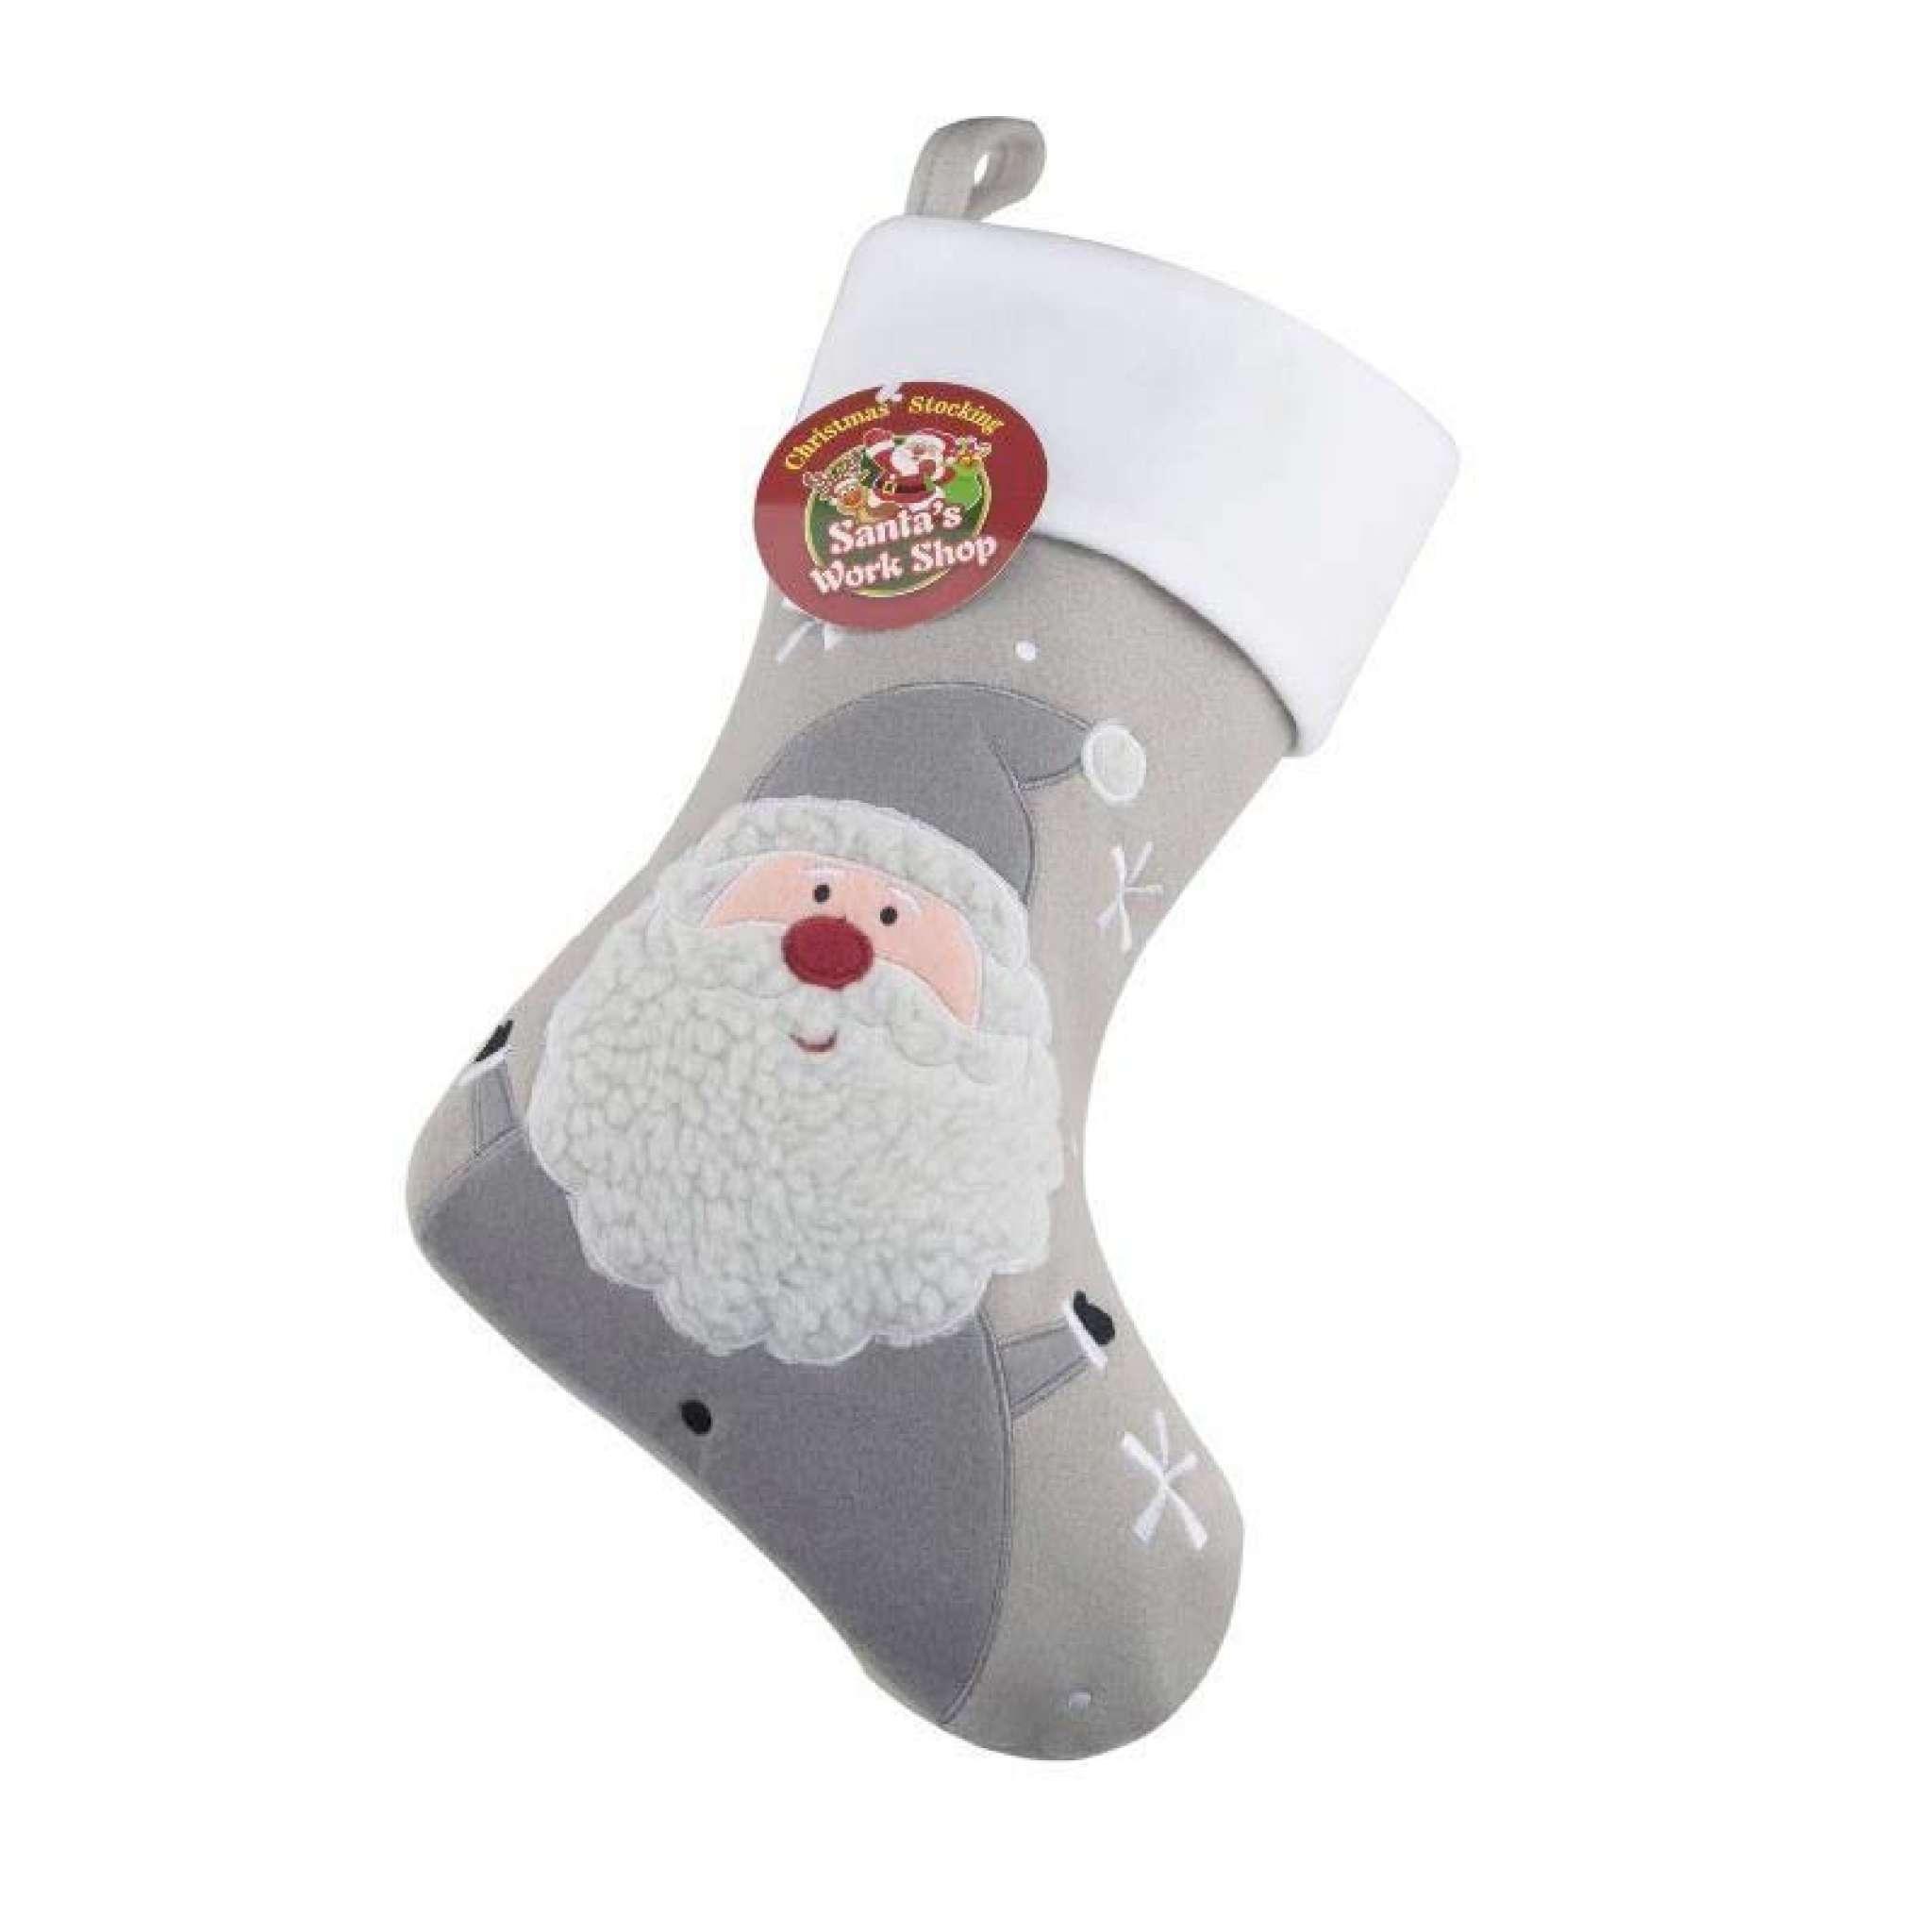 Joulusukka Premium, Joulutonttu Harmaa